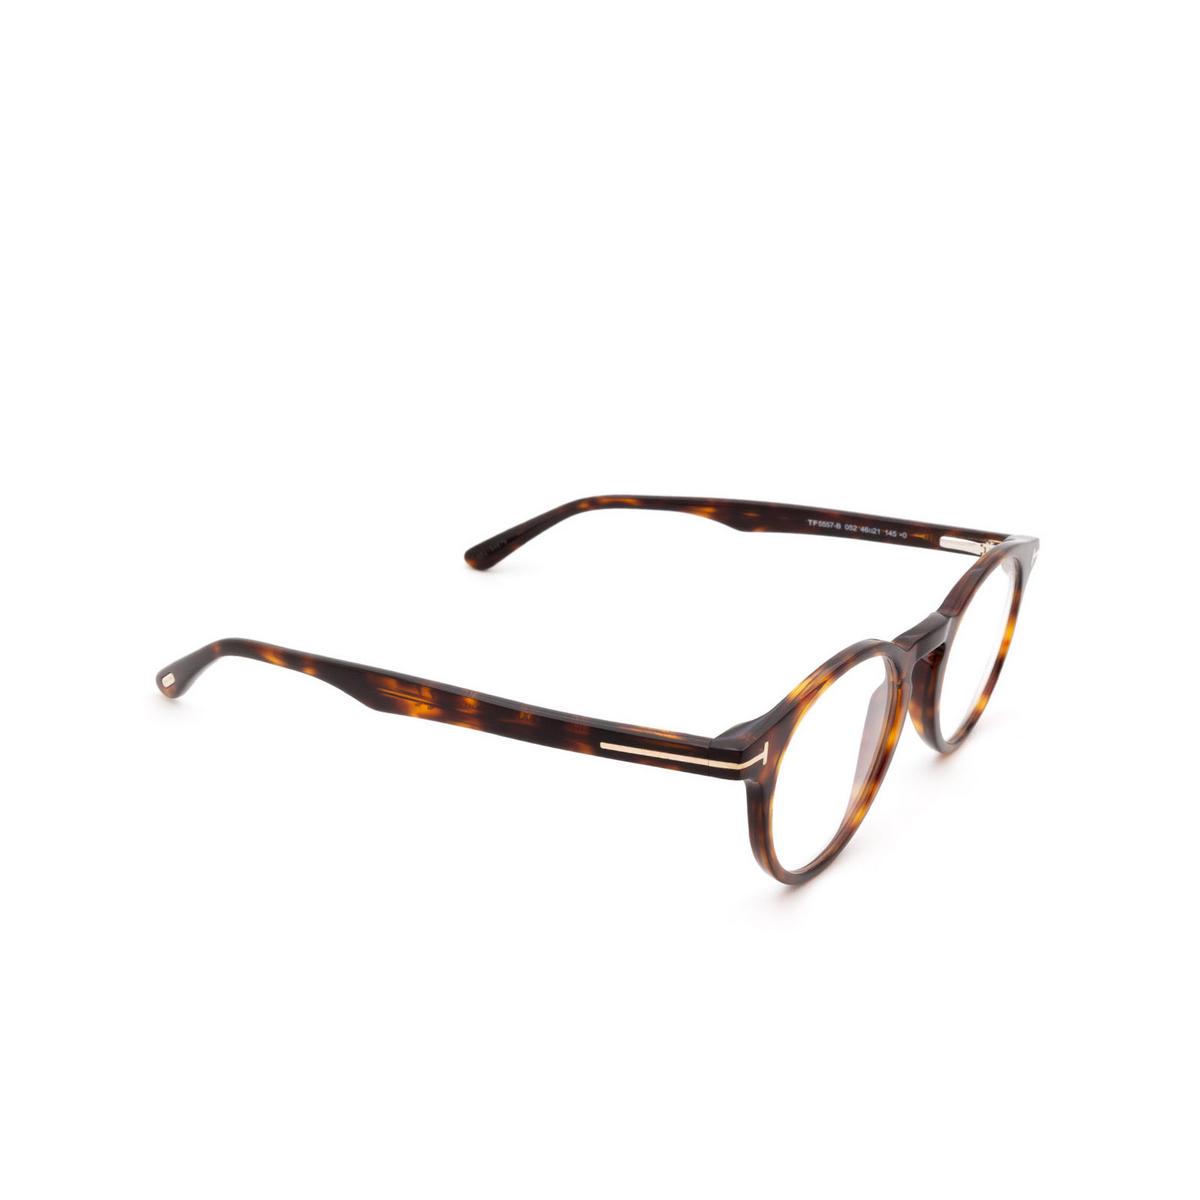 Tom Ford® Round Eyeglasses: FT5557-B color Dark Havana 052 - three-quarters view.